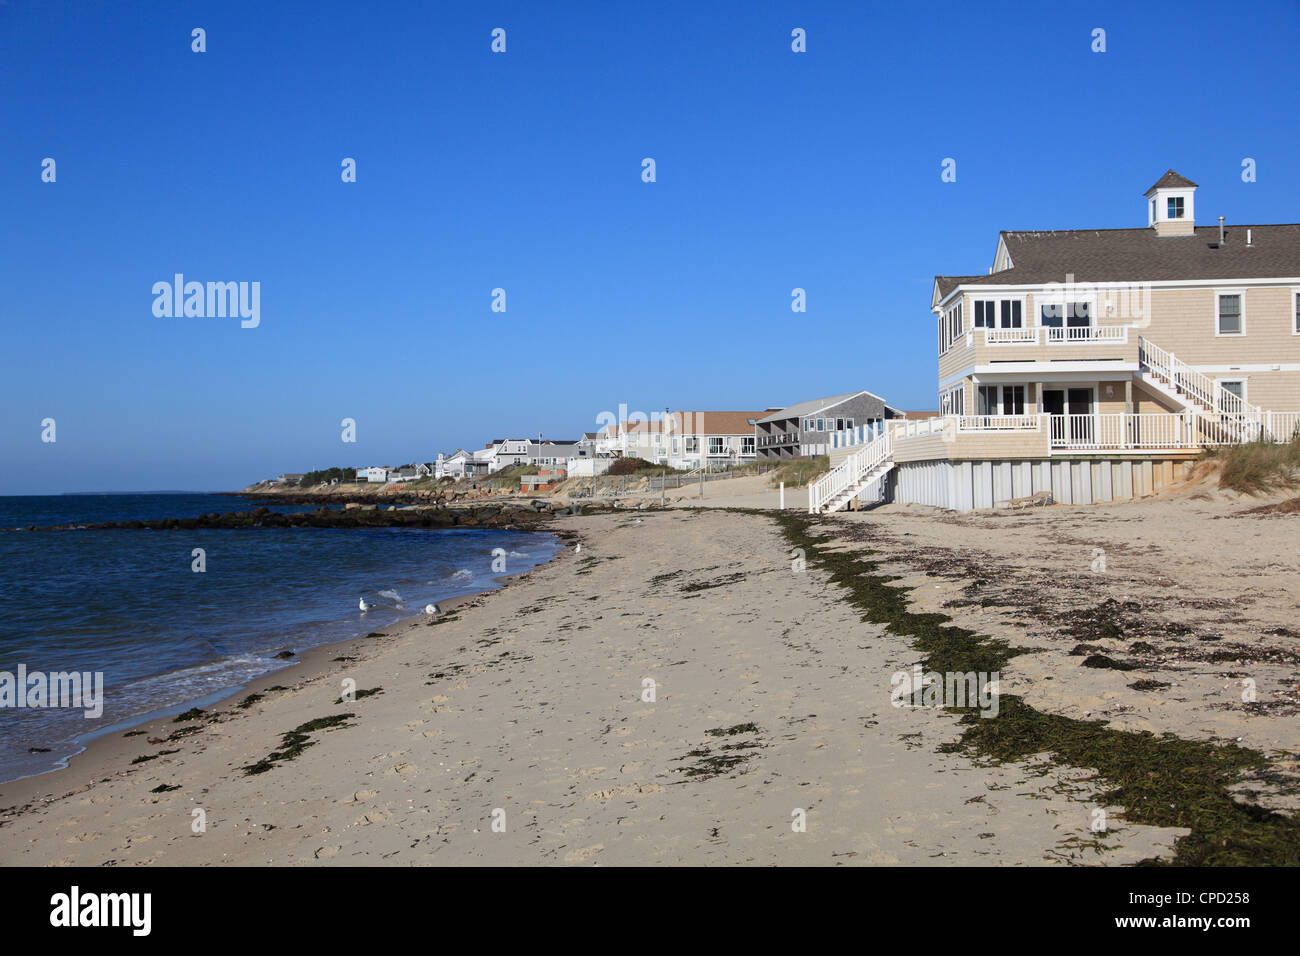 61 Old Wharf, Dennis MA - 22000307   Beach Realty Cape Cod